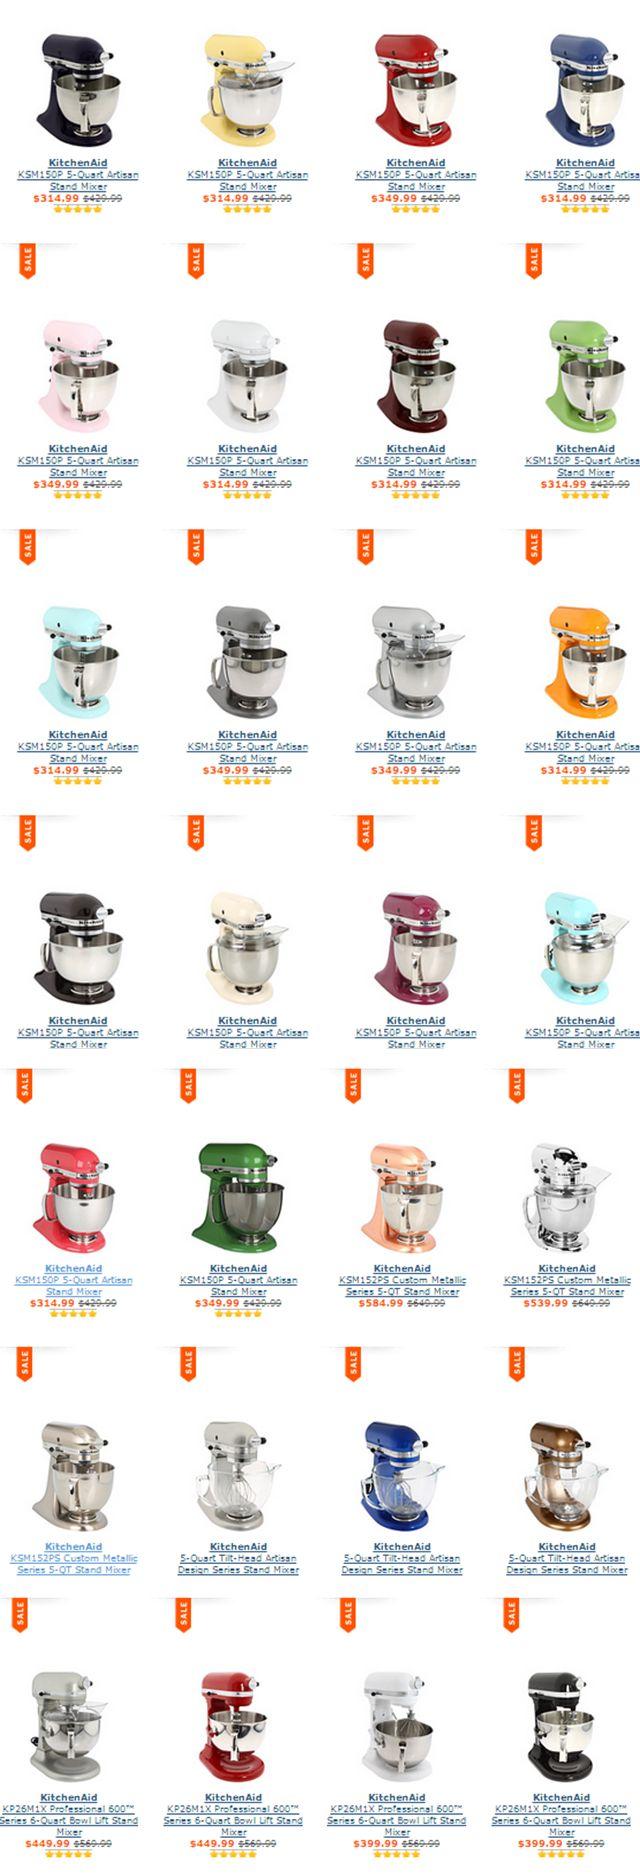 KitchenAid Artisan Design 5 & 6 Quart Mixers / On sale today http://rstyle.me/n/dchgwn2bn